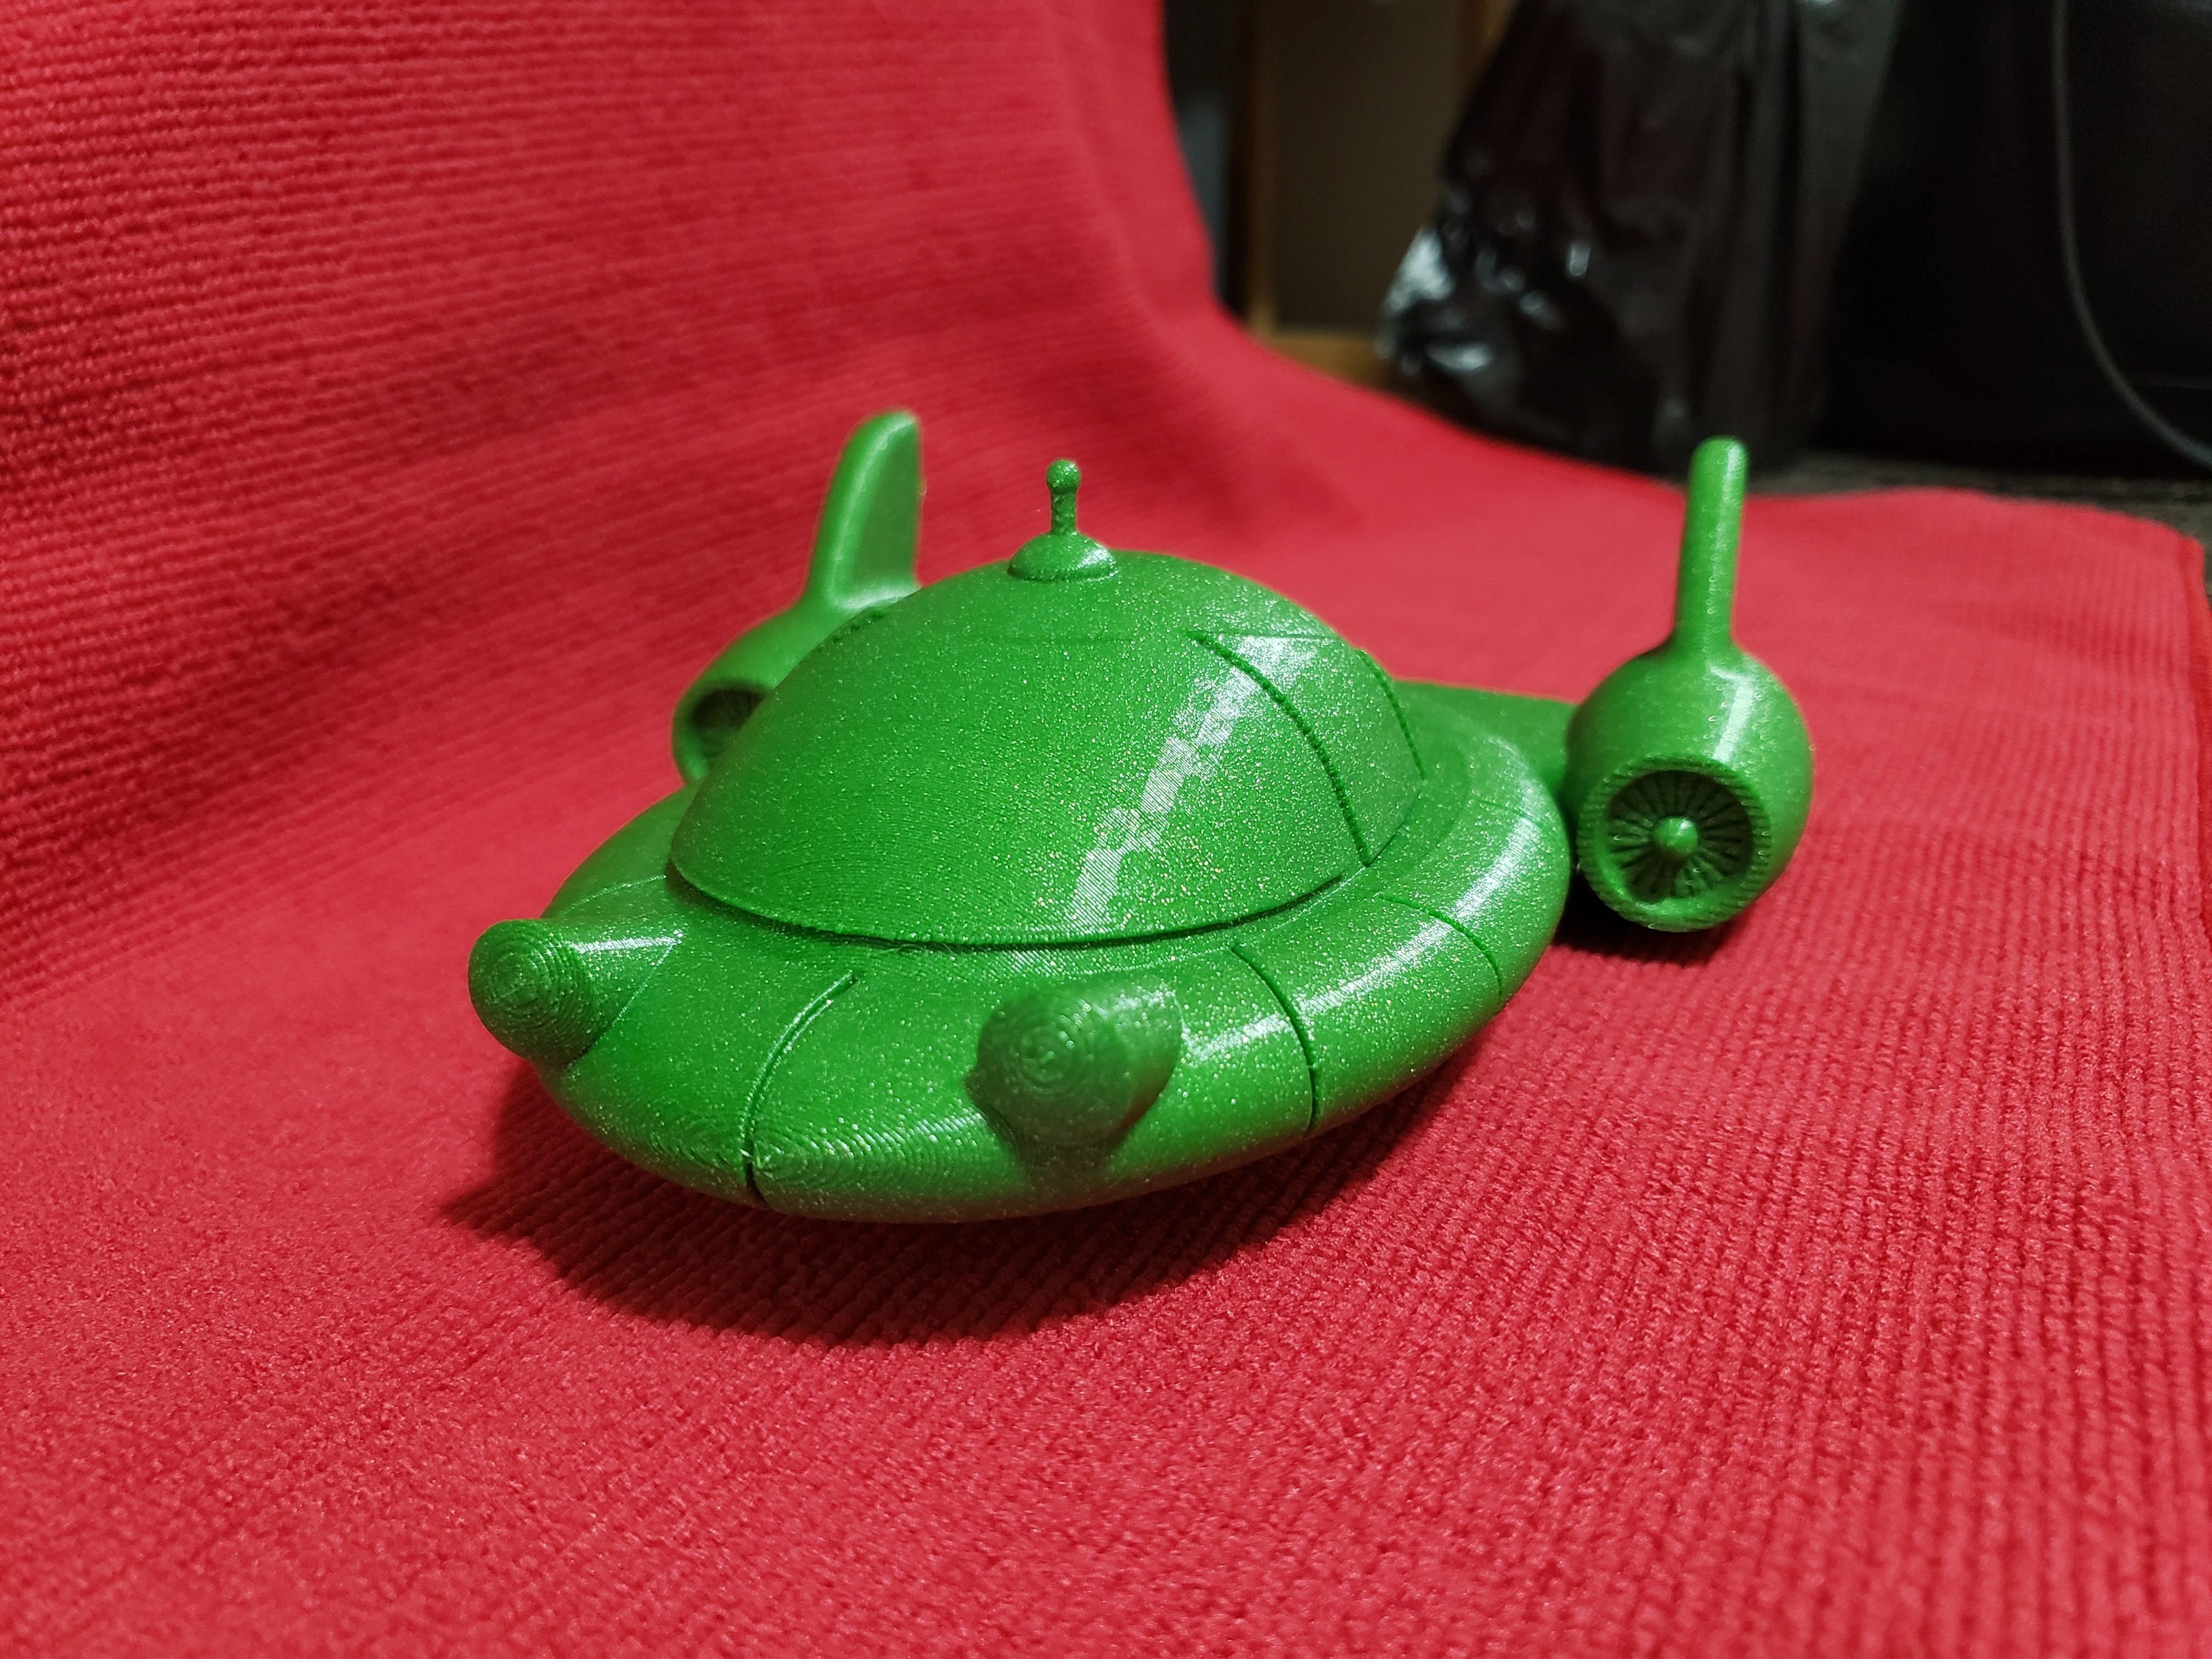 20191201_093352.jpg Download free STL file Little Einsteins Pat Pat Rocket • 3D printable object, Dsk